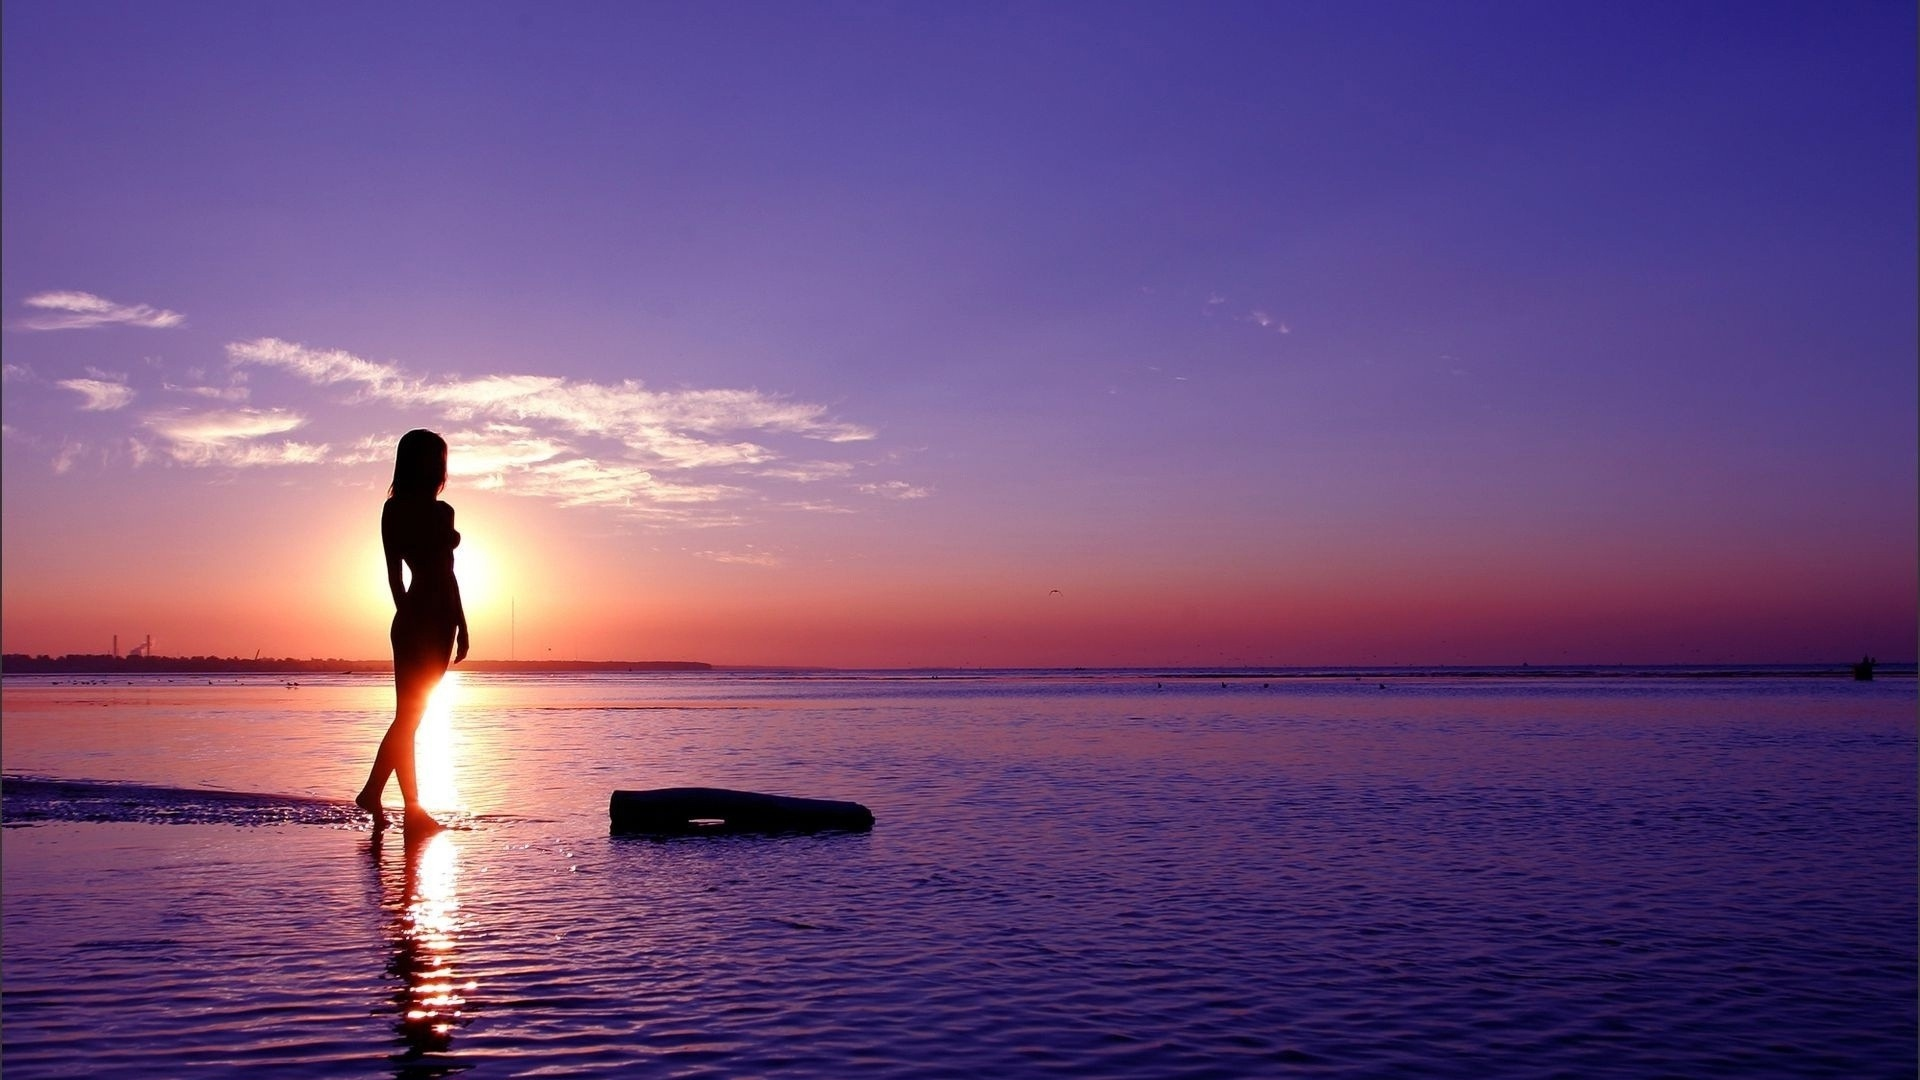 SheIsland. կղզի, որտեղ կարող են հանգստանալ միայն կանայք (լուսանկարներ)